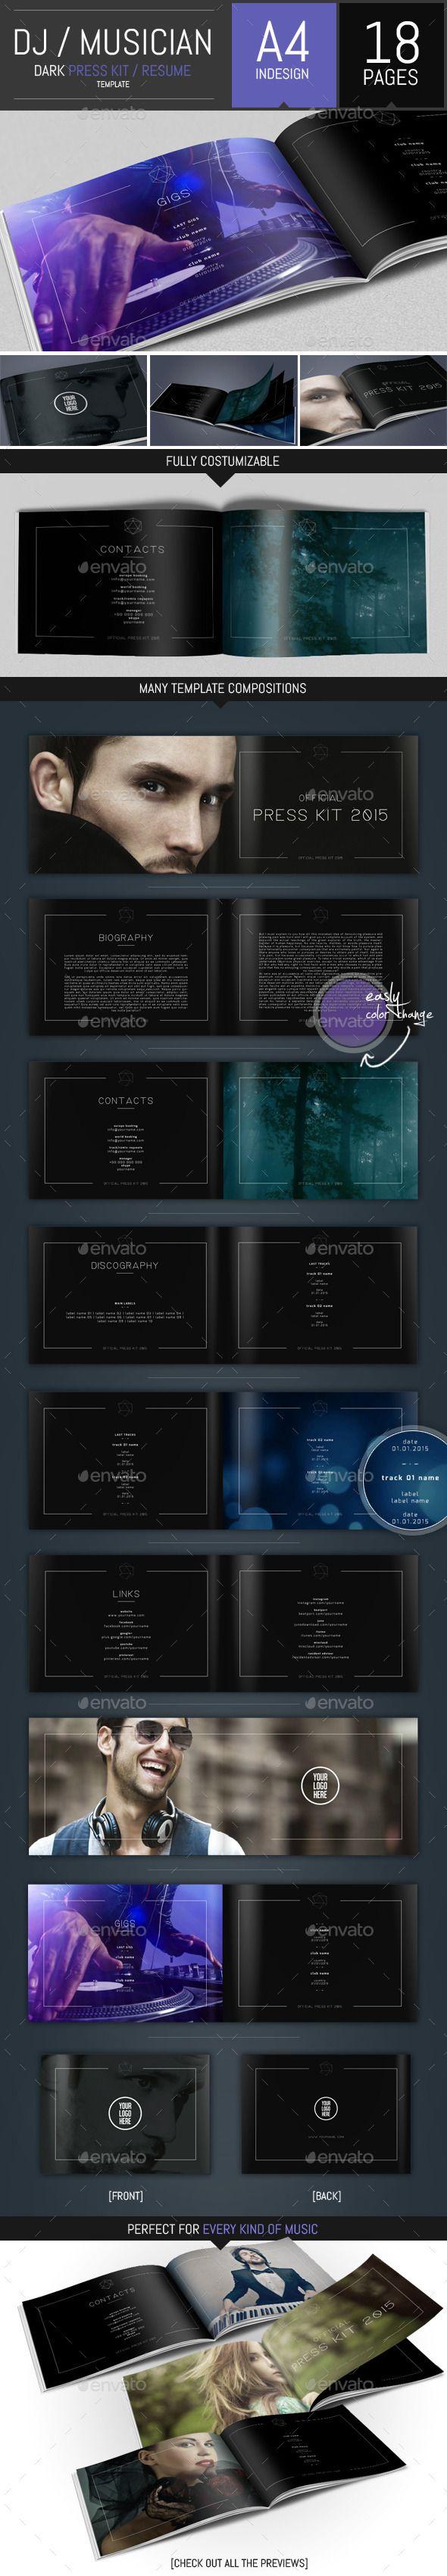 Musicians Resume Template Impressive Dj And Musician Dark Press Kit  Resume Template — Vector Eps .